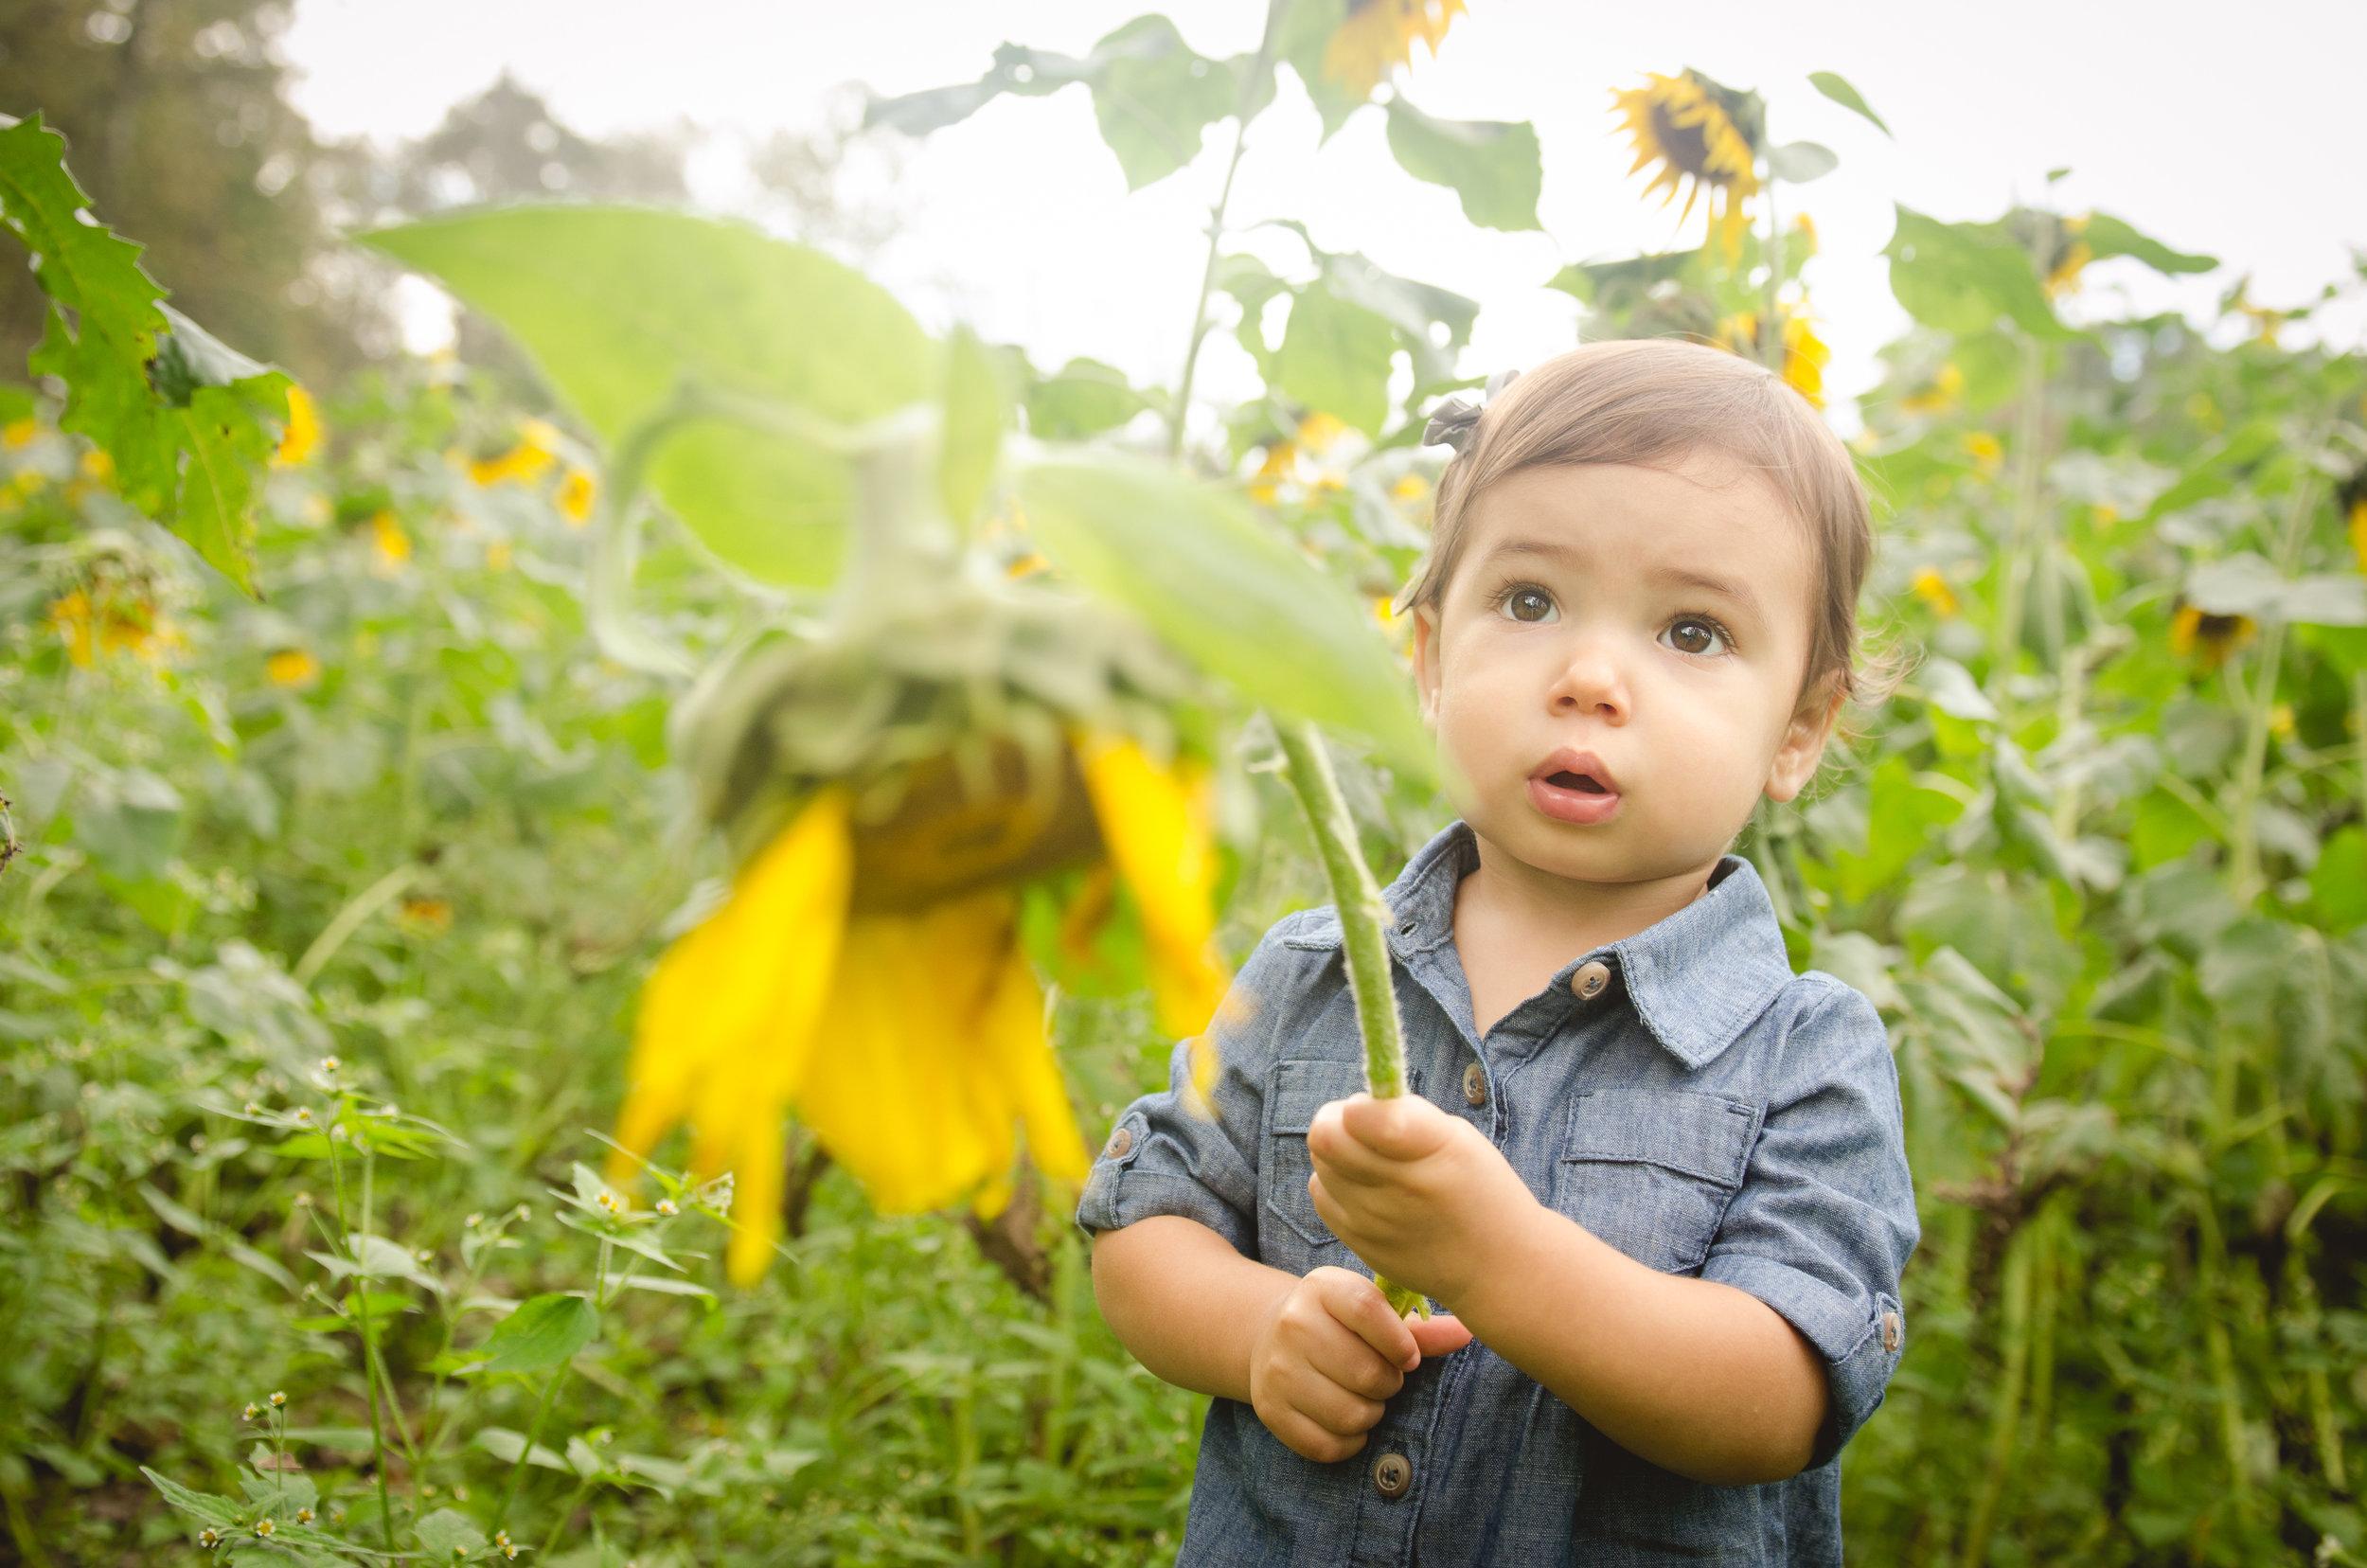 Tabors_Sunflowers-3.jpg